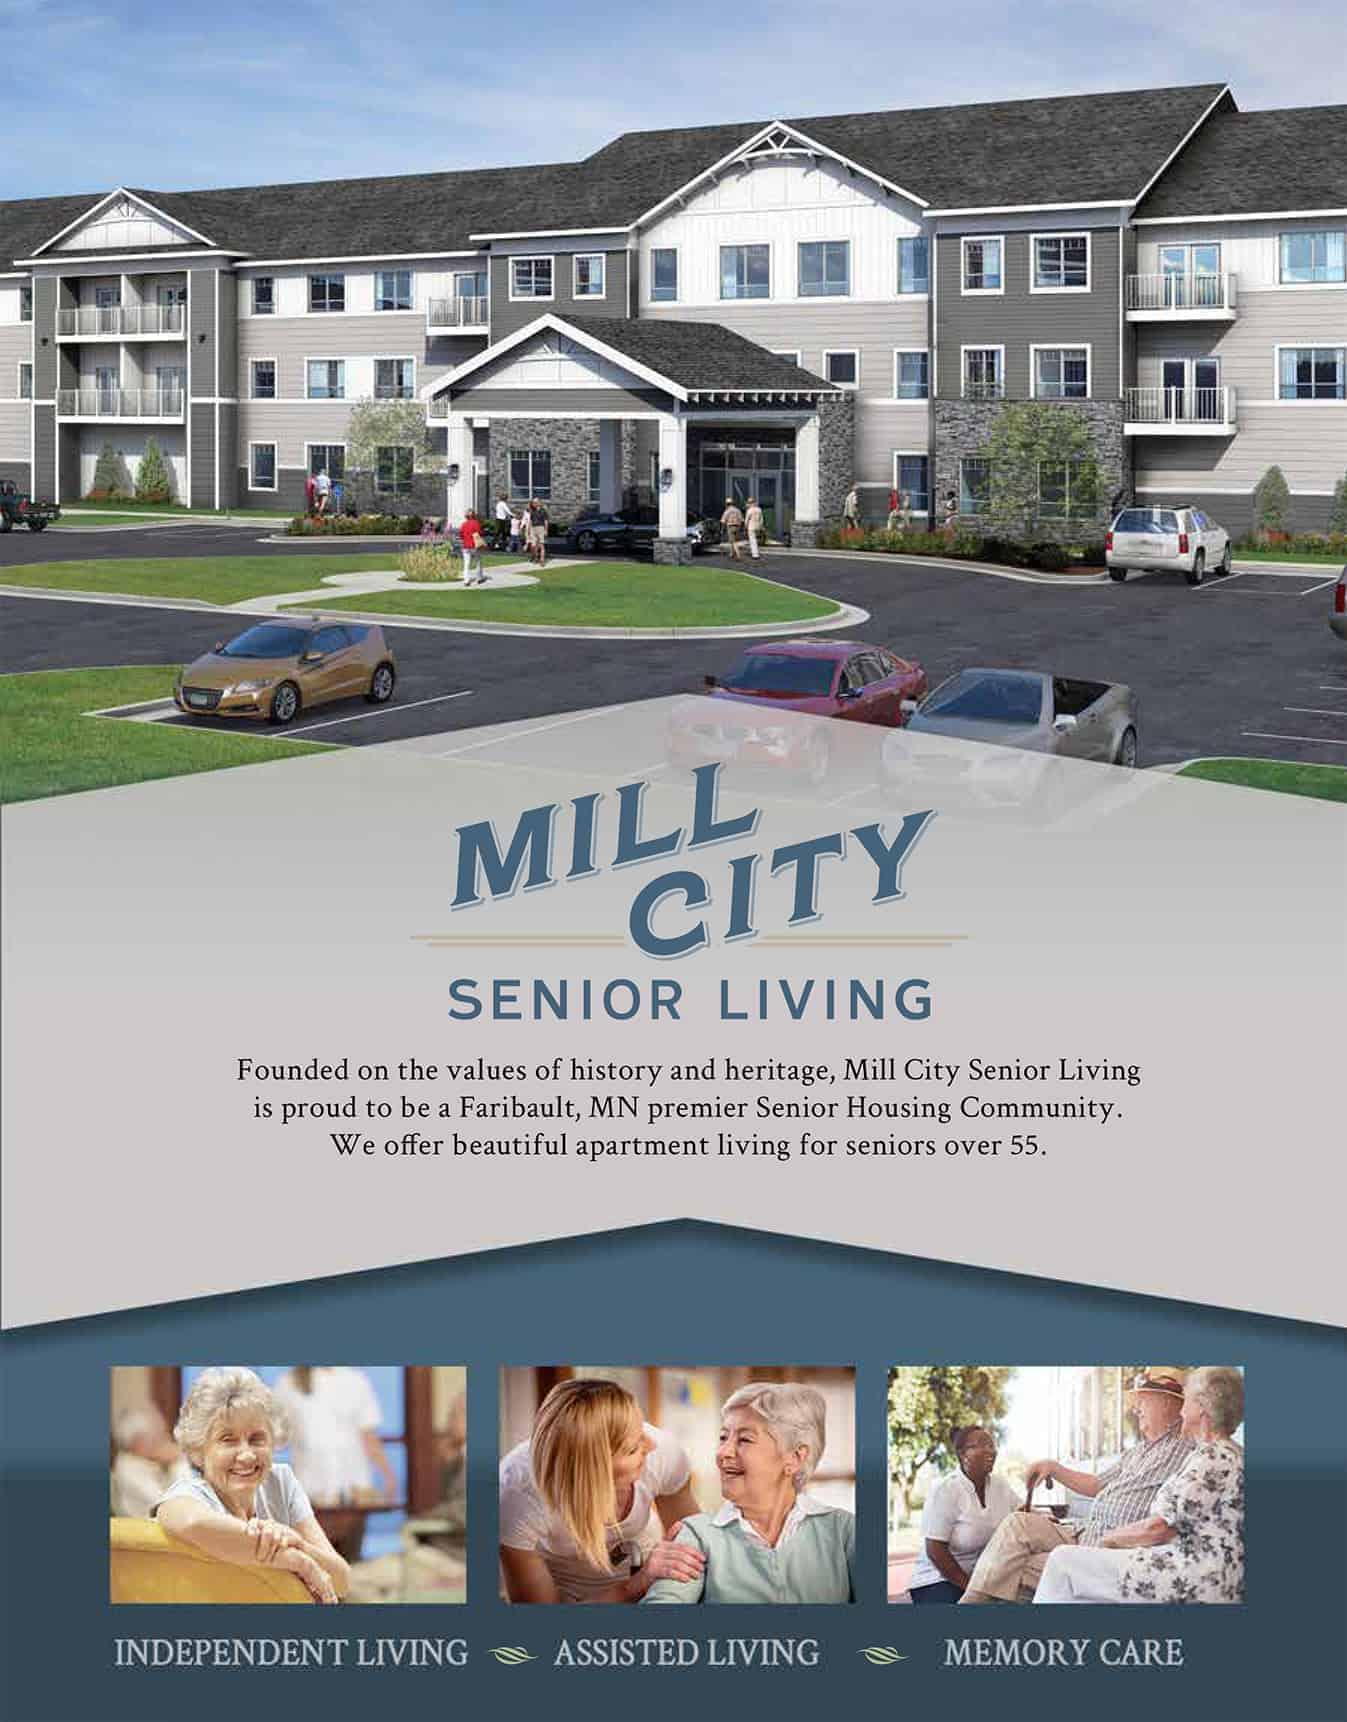 Mill City Senior Living